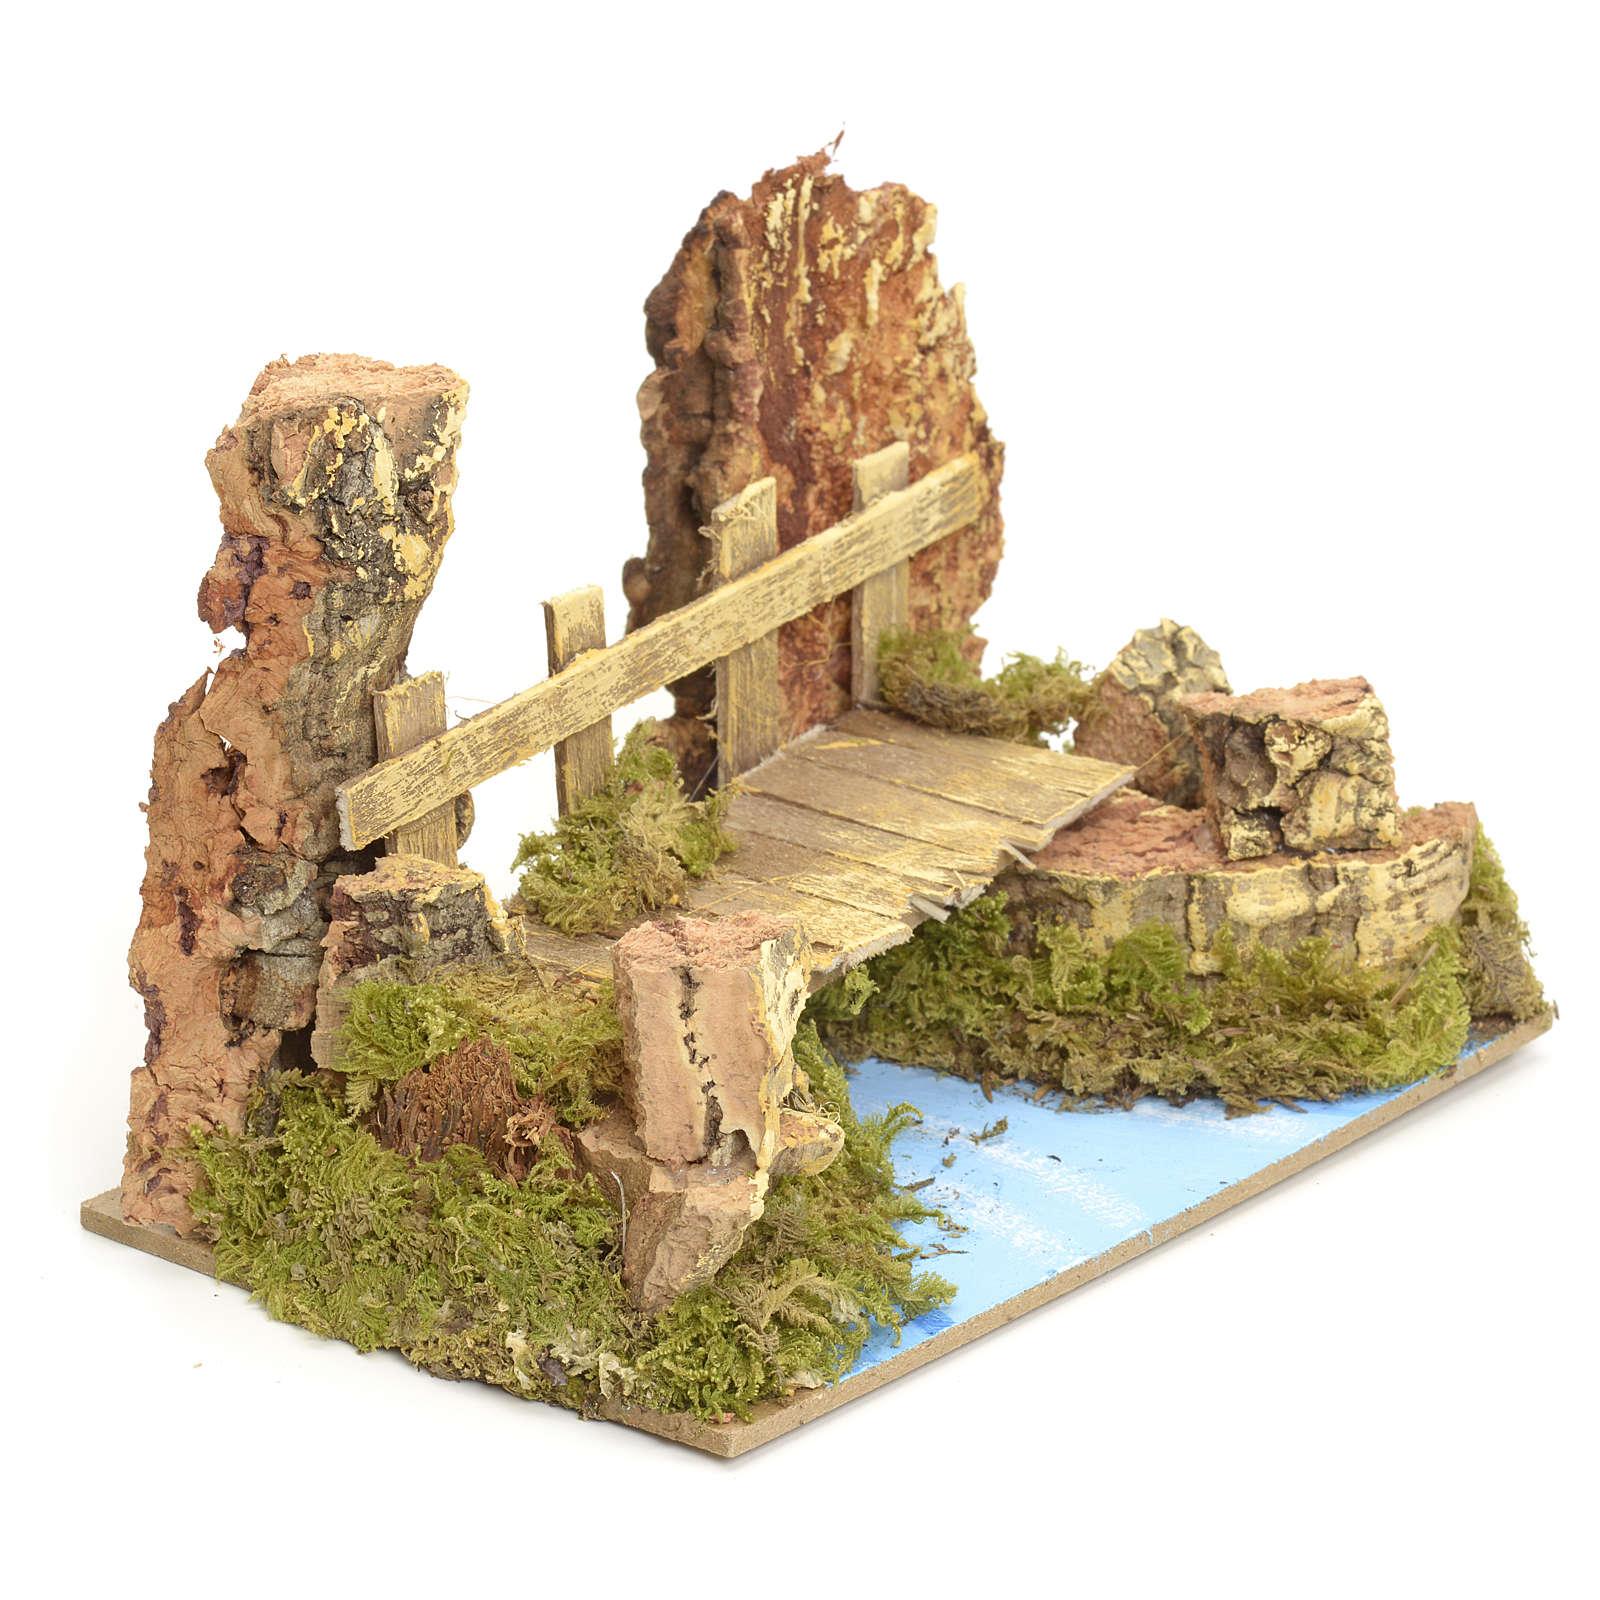 Puente sobre río 10x15x10 cm para pesebre 4